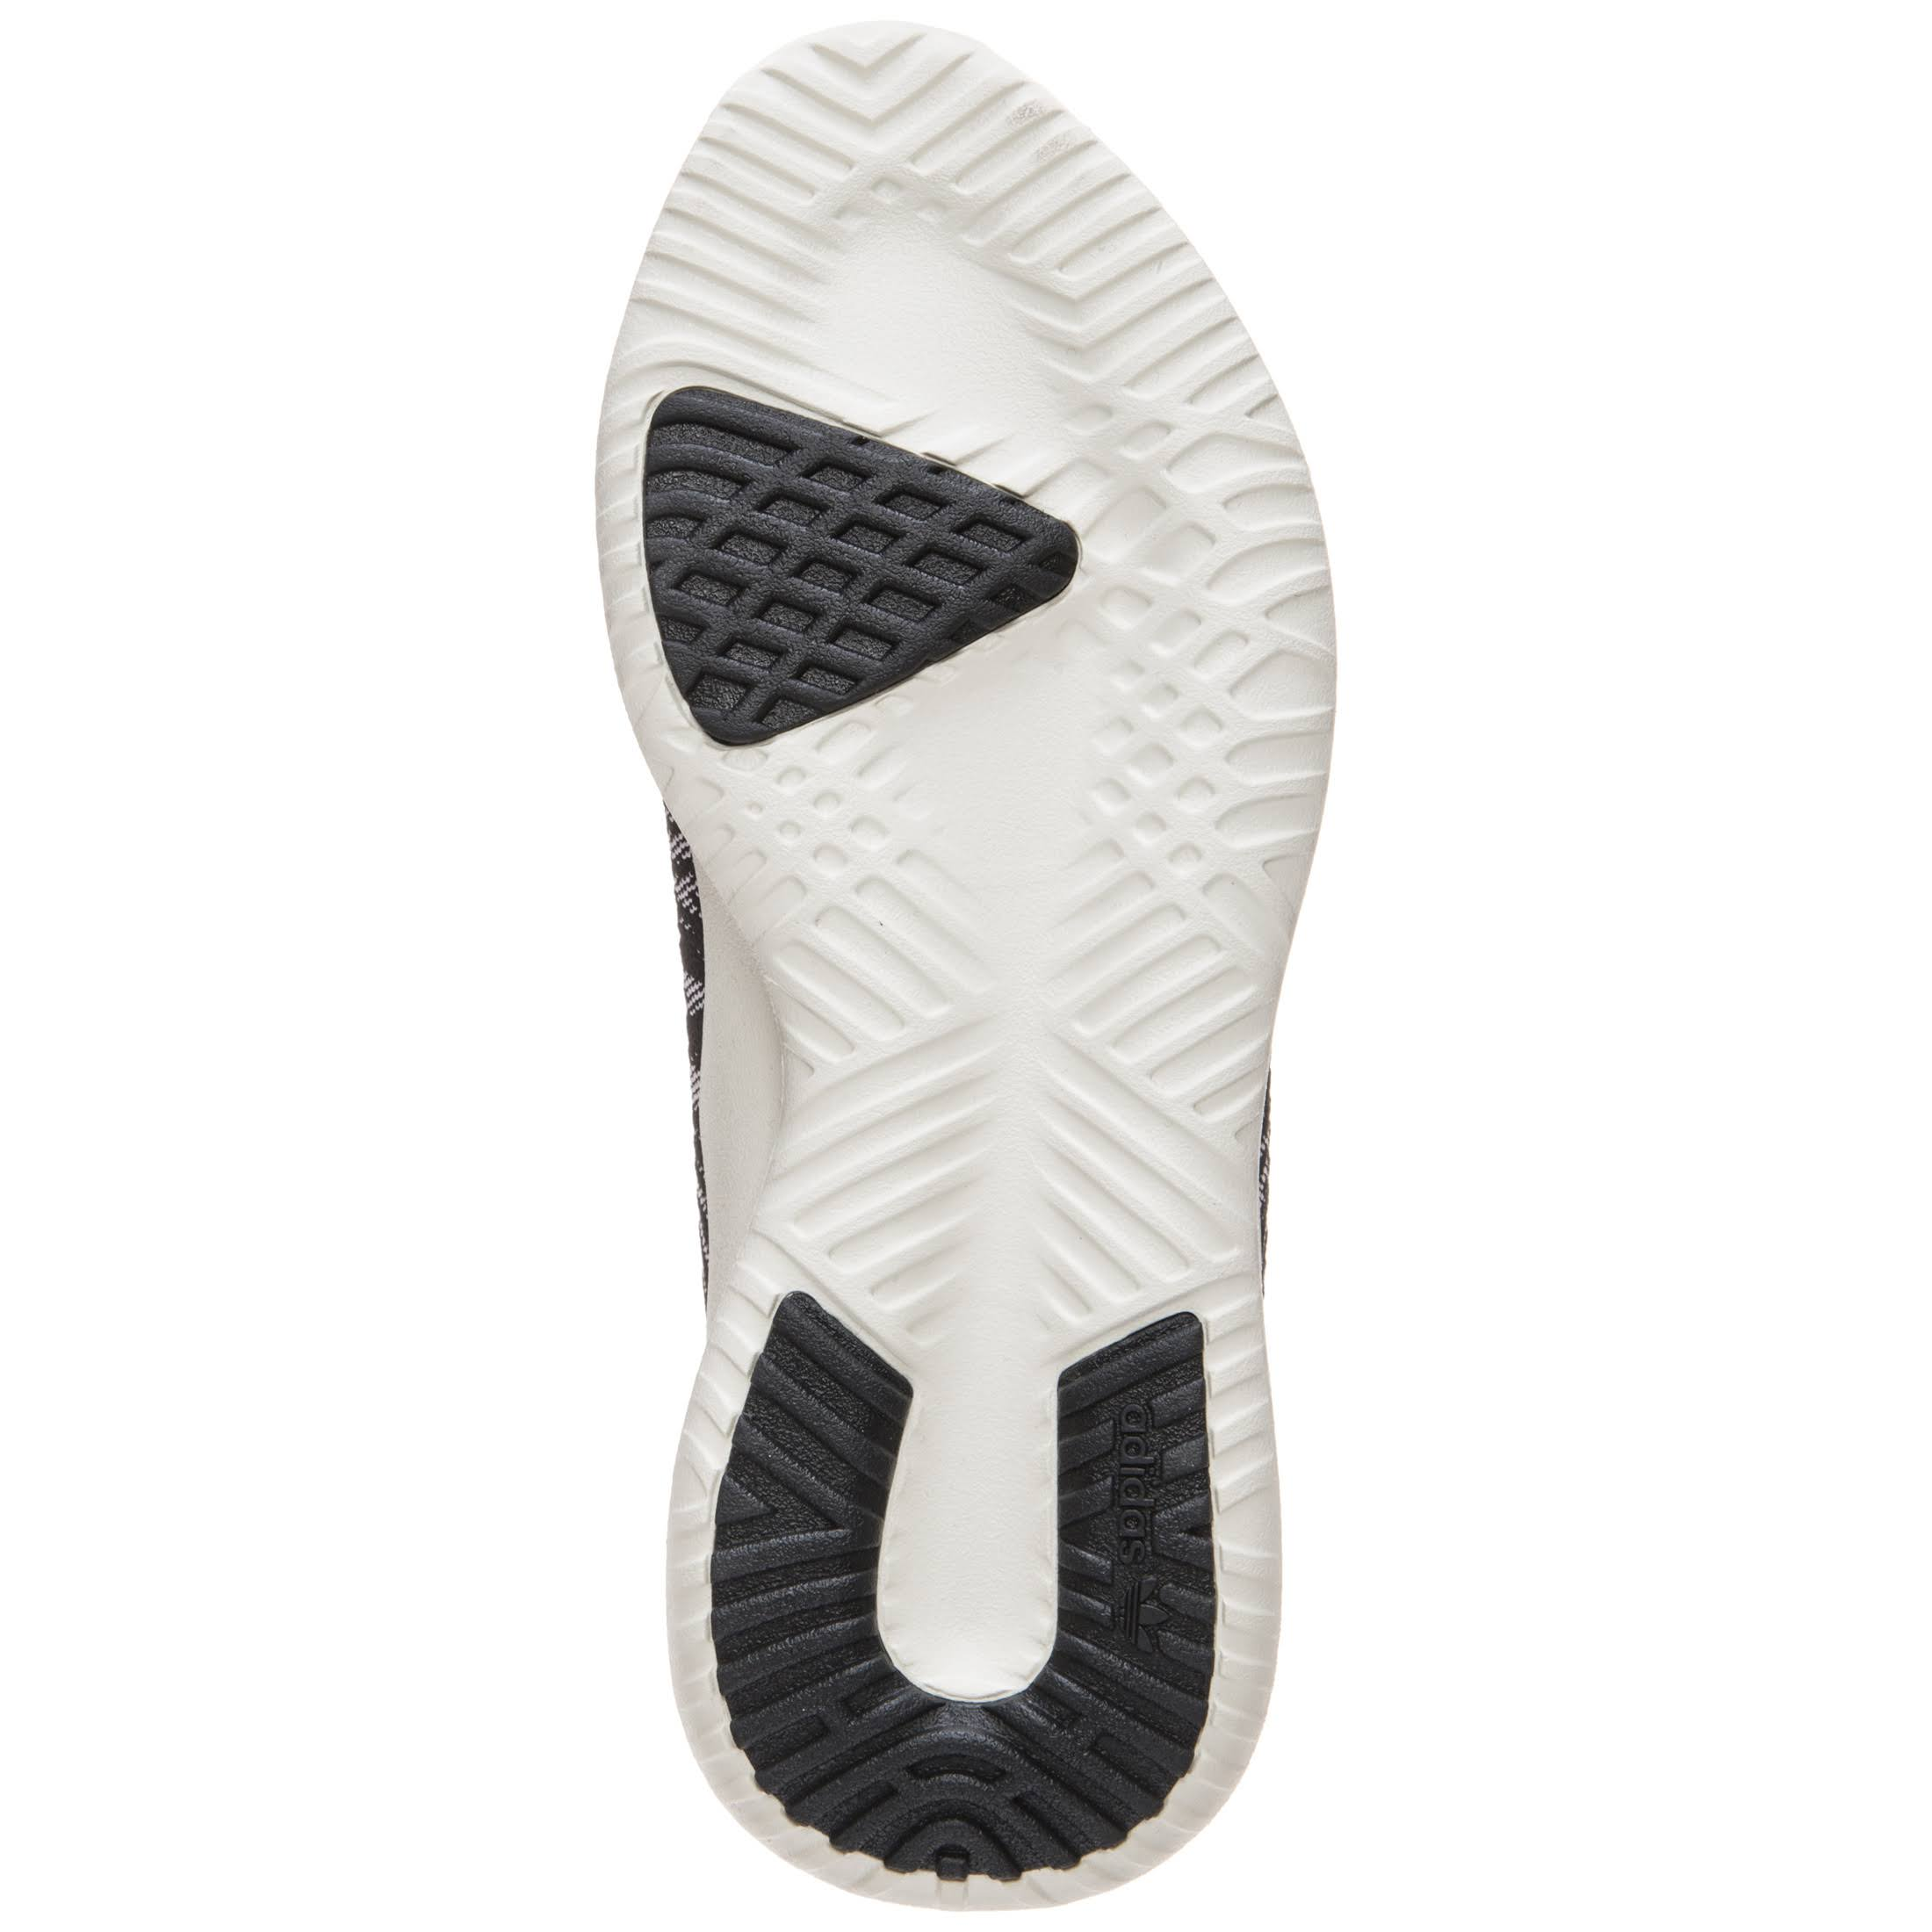 core Off White Adidas Tubular Schwarz Shadow Aero weiß W Pink Black qtpCp6x4